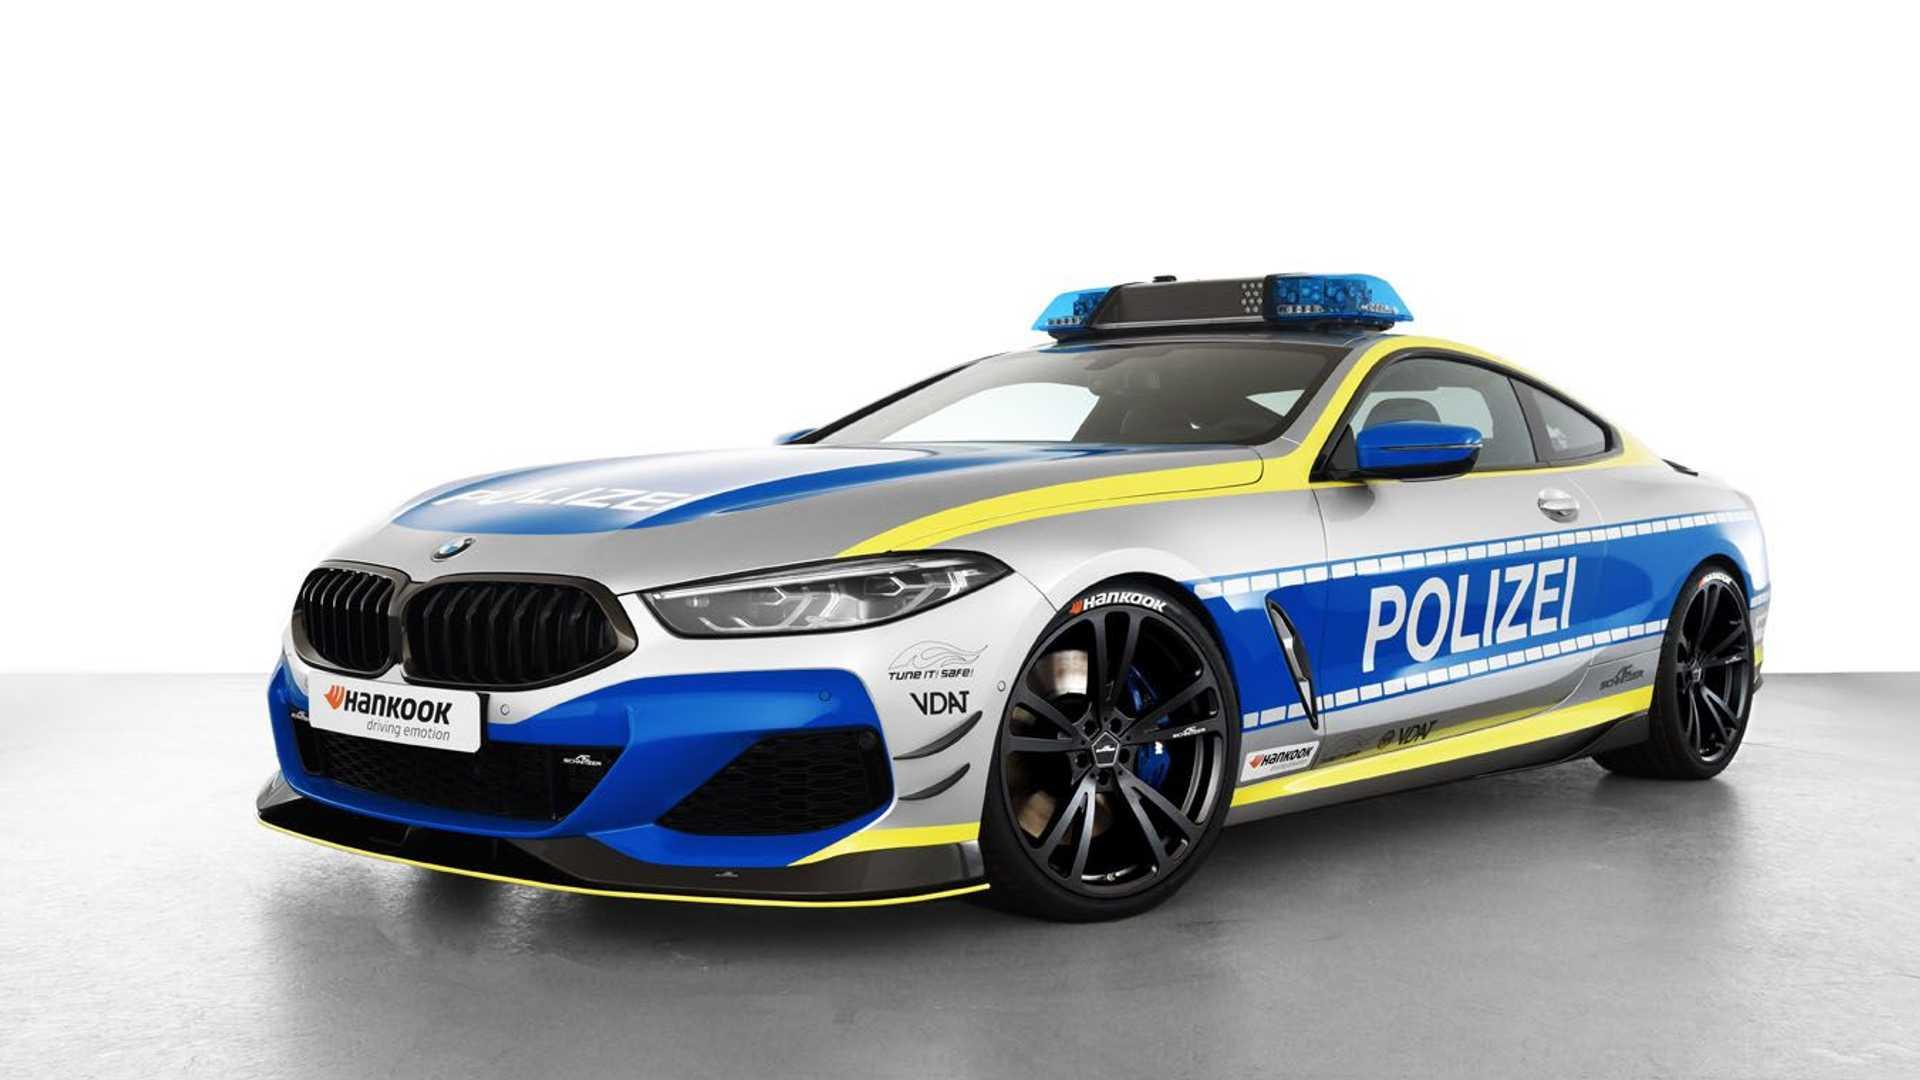 BMW-M850i-police-car-tune-it-safe-15